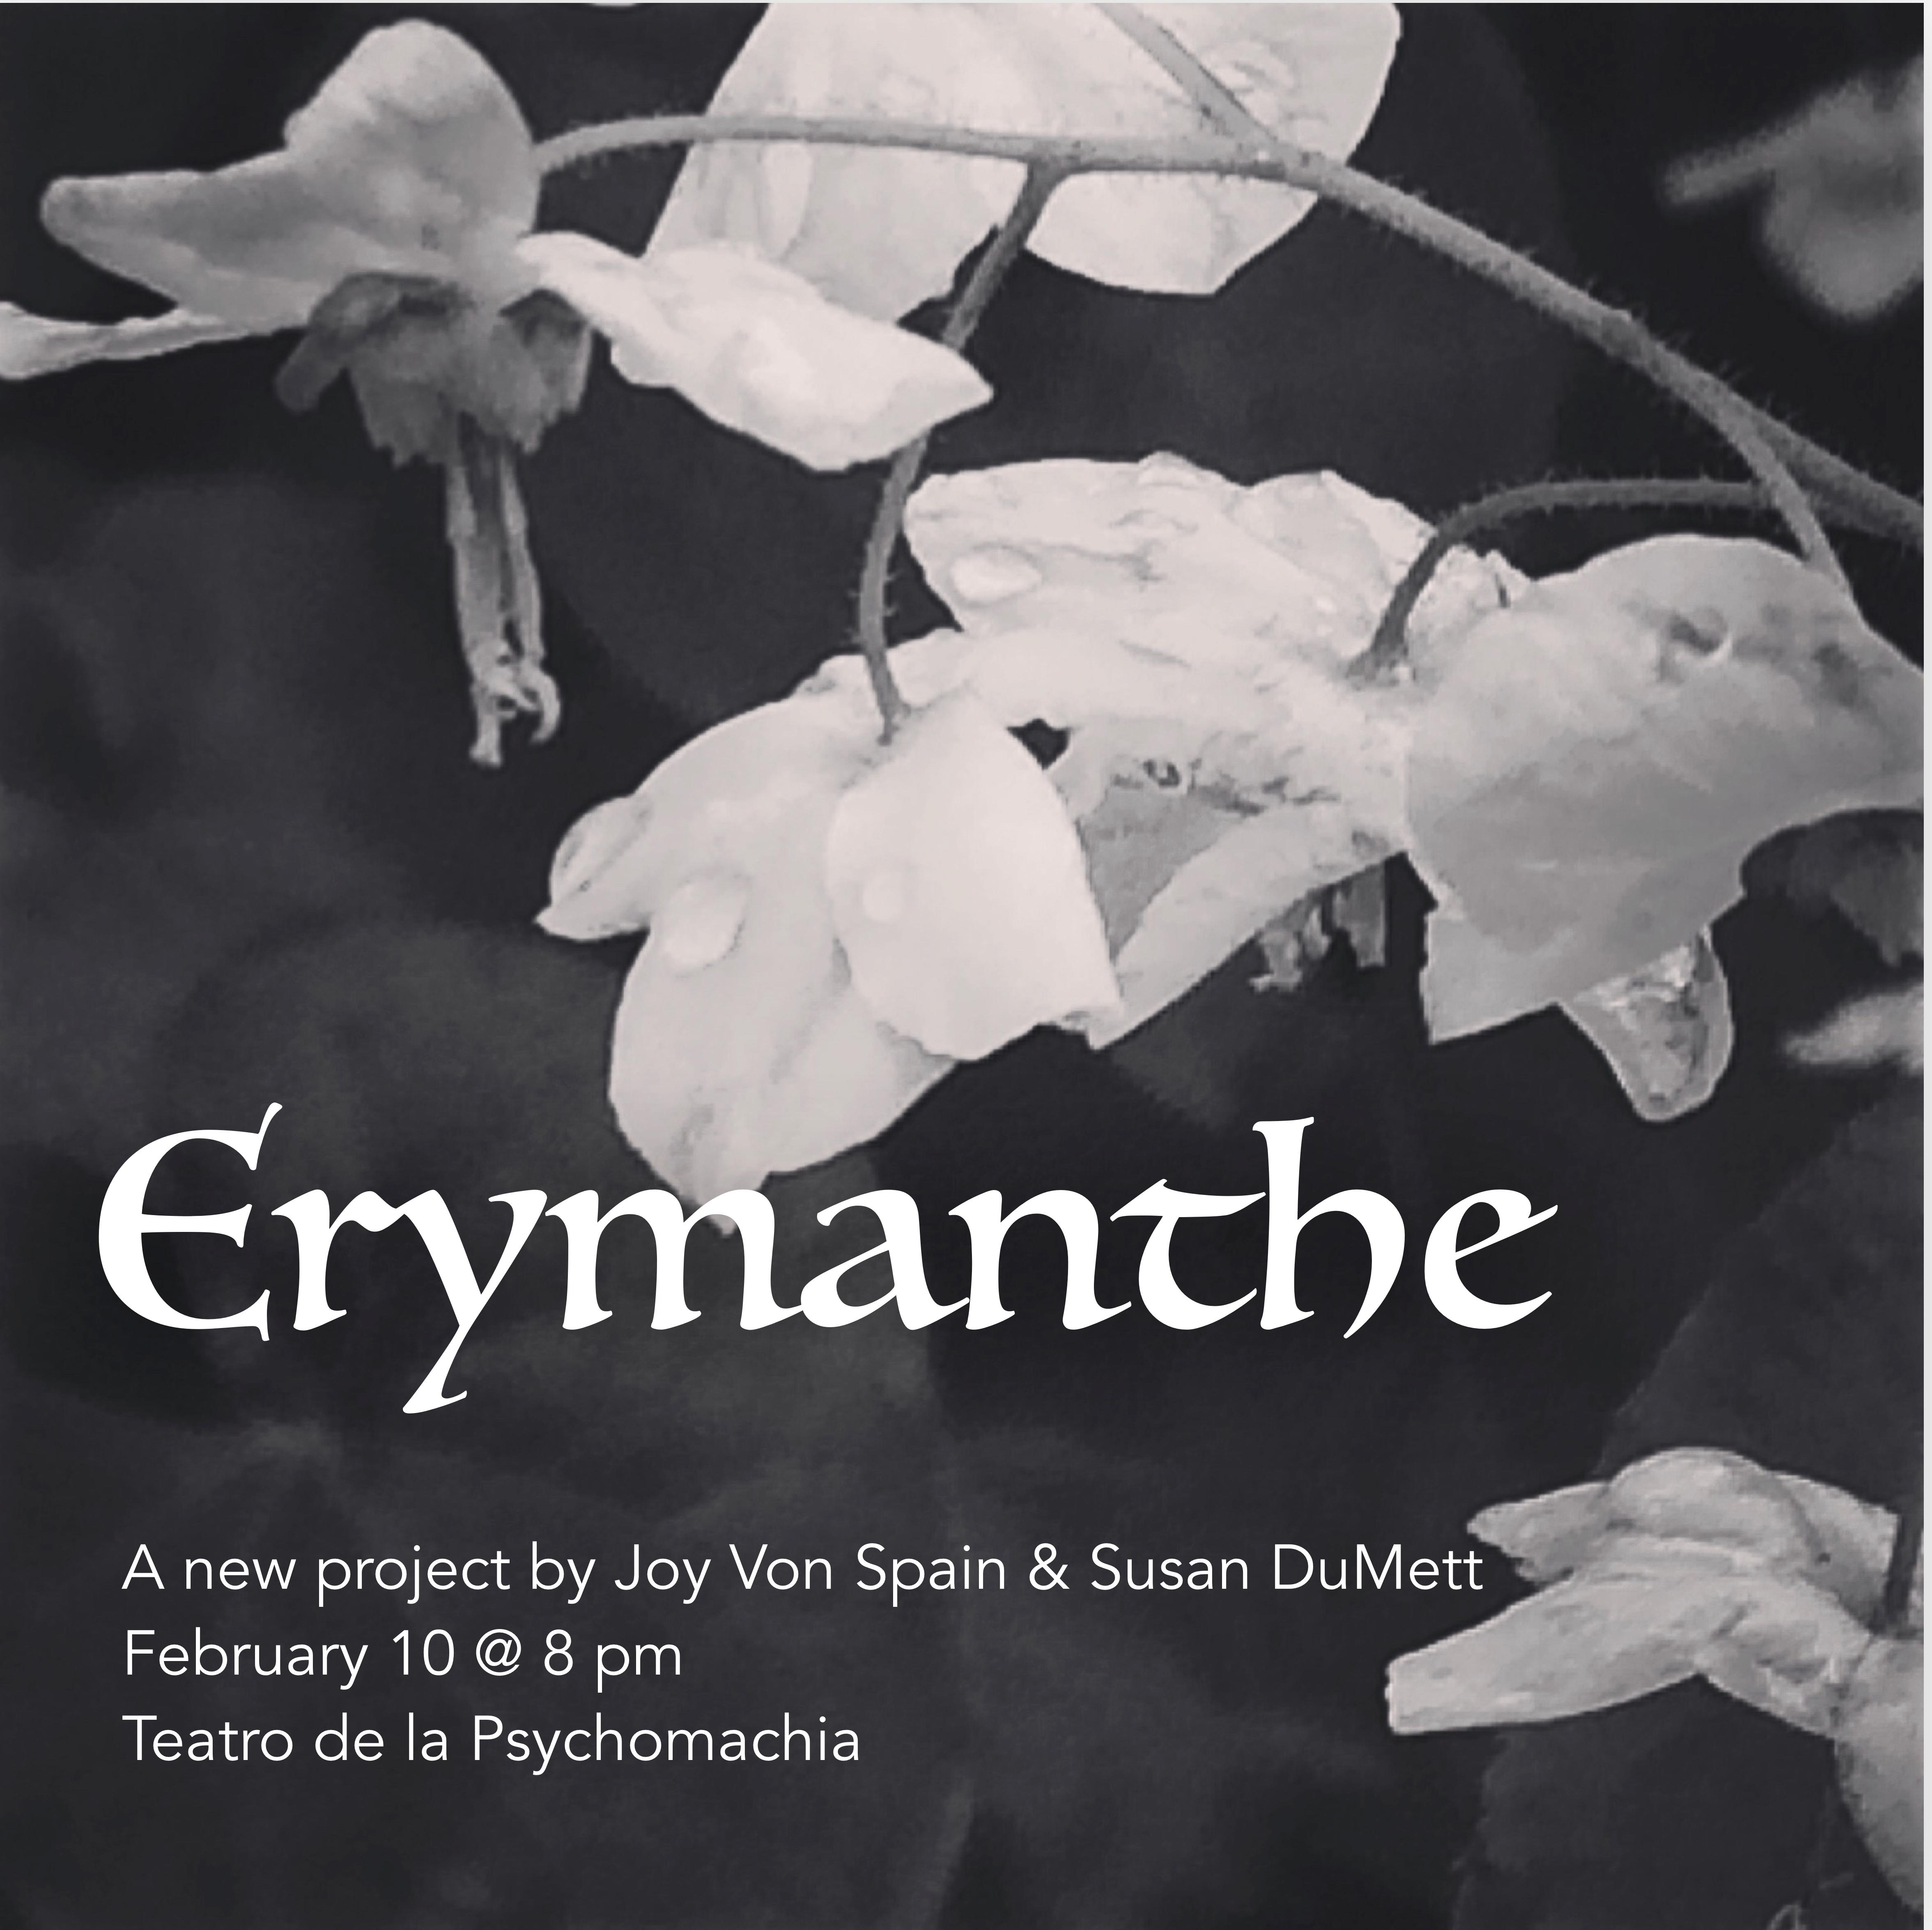 Erymanthe 2-10-18